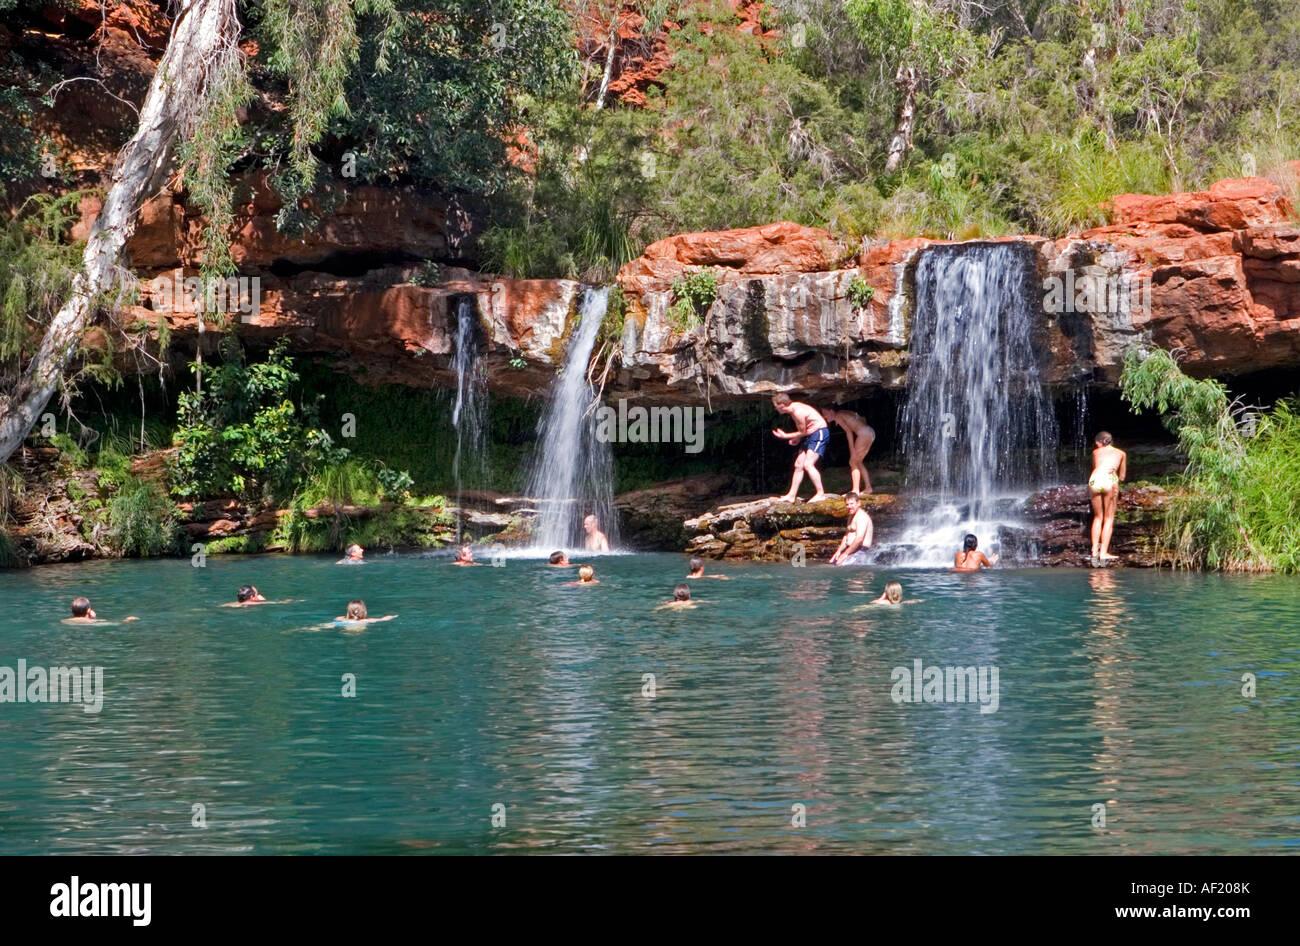 Fern Pool In Karijini National Park Western Australia Stock Photo 13804770 Alamy